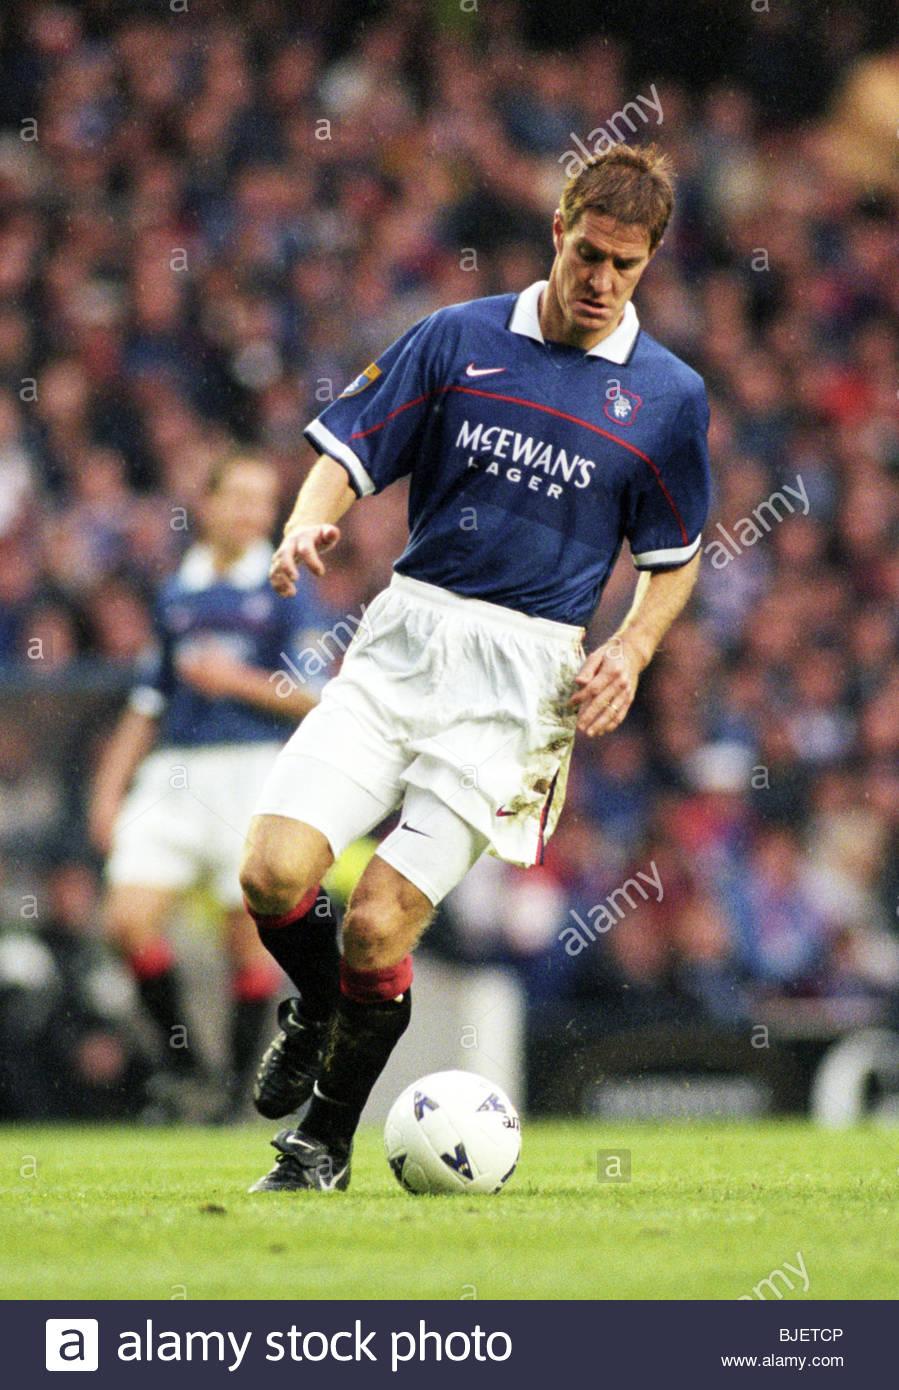 08/11/97 BELL'S PREMIER DIVISION RANGERS V CELTIC (1-0) IBROX - GLASGOW Richard Gough in action for Rangers. - Stock Image